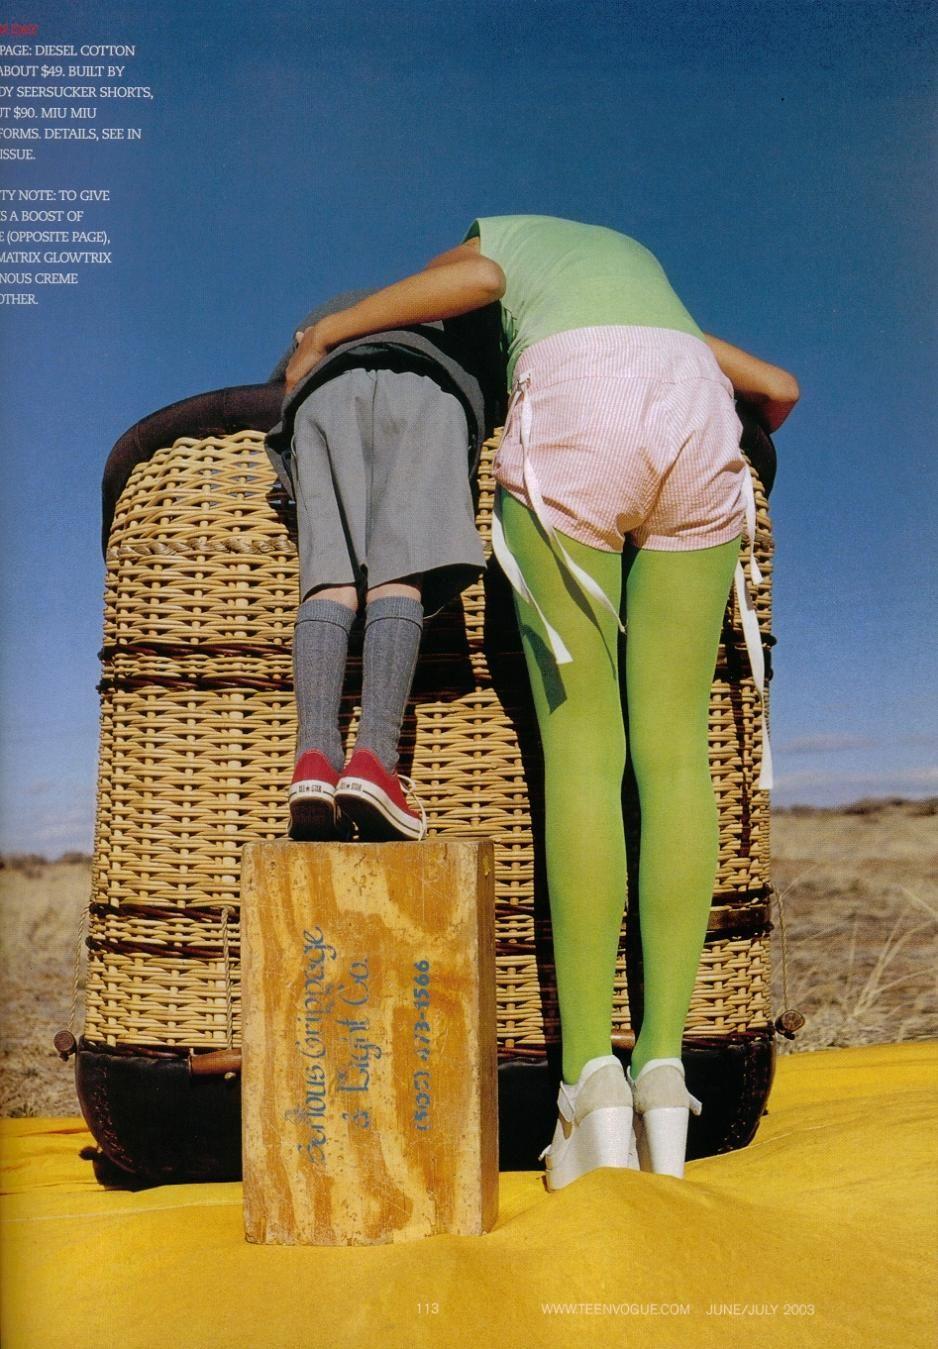 TEEN VOGUE JUNE/JULY 2003  FLYING COLORS  MODEL: LOUISE  HAIR: JULIEN LE BAS  MAKE-UP: EMMA LOVELL  PHOTOGRAPHER: TIM WALKER  FASHION EDITOR: CAMILLA BIDAULT-WADDINGTON